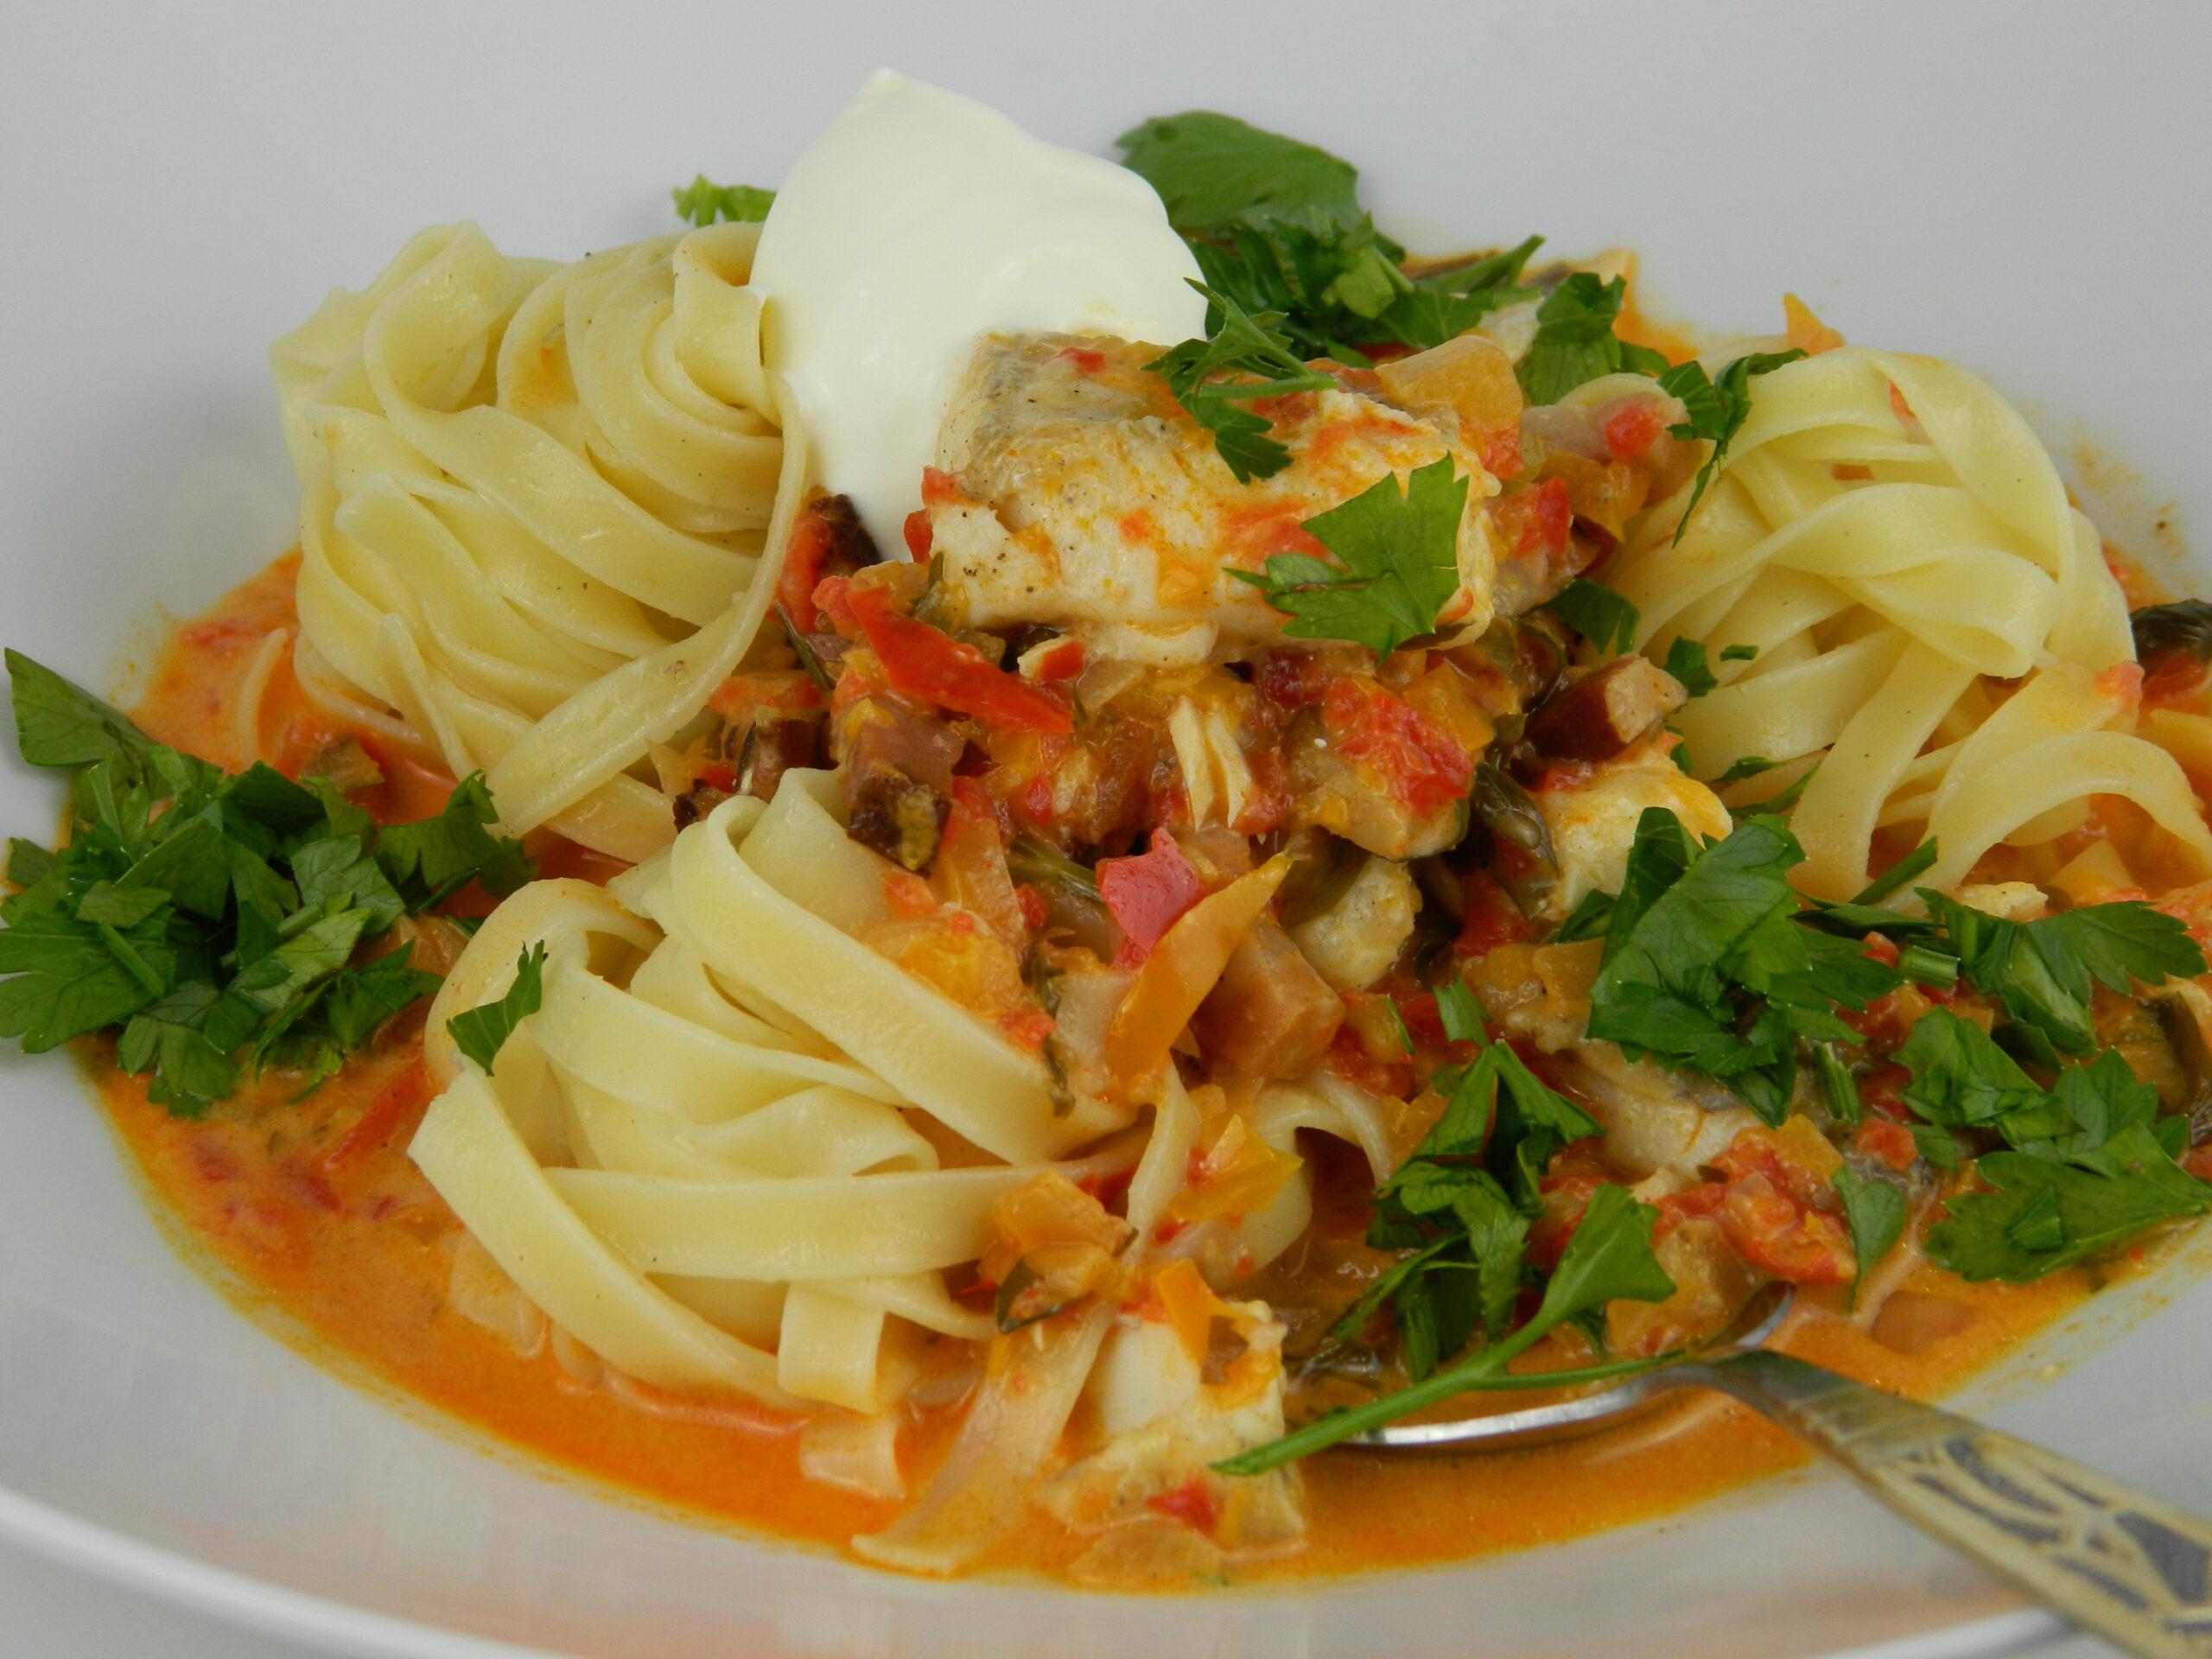 zander fish stew